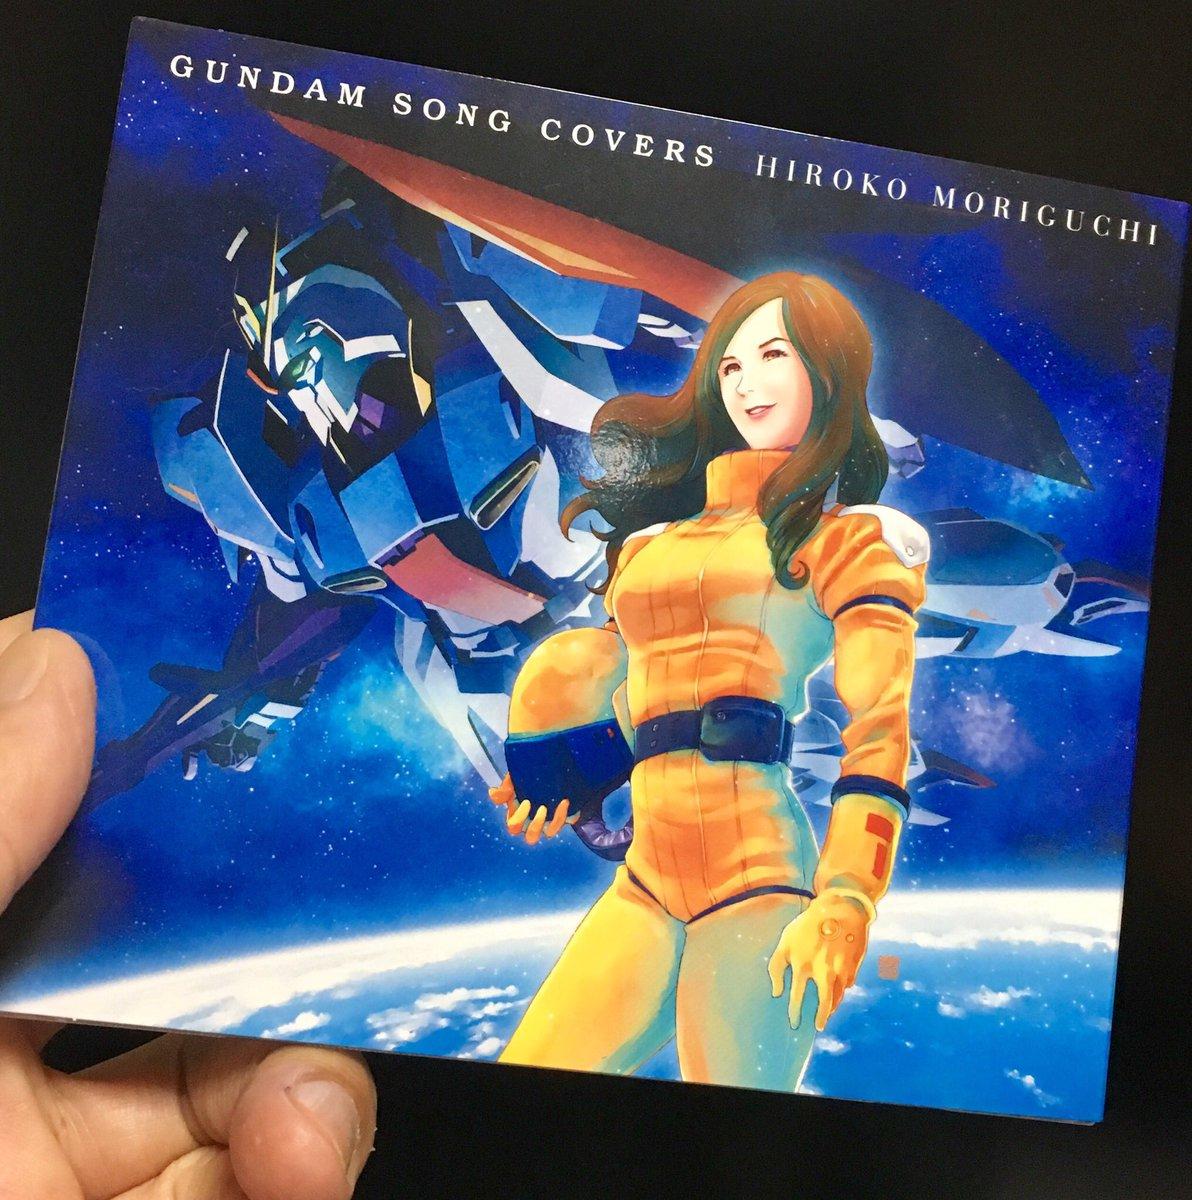 GUNDAM SONG COVERSに関する画像20